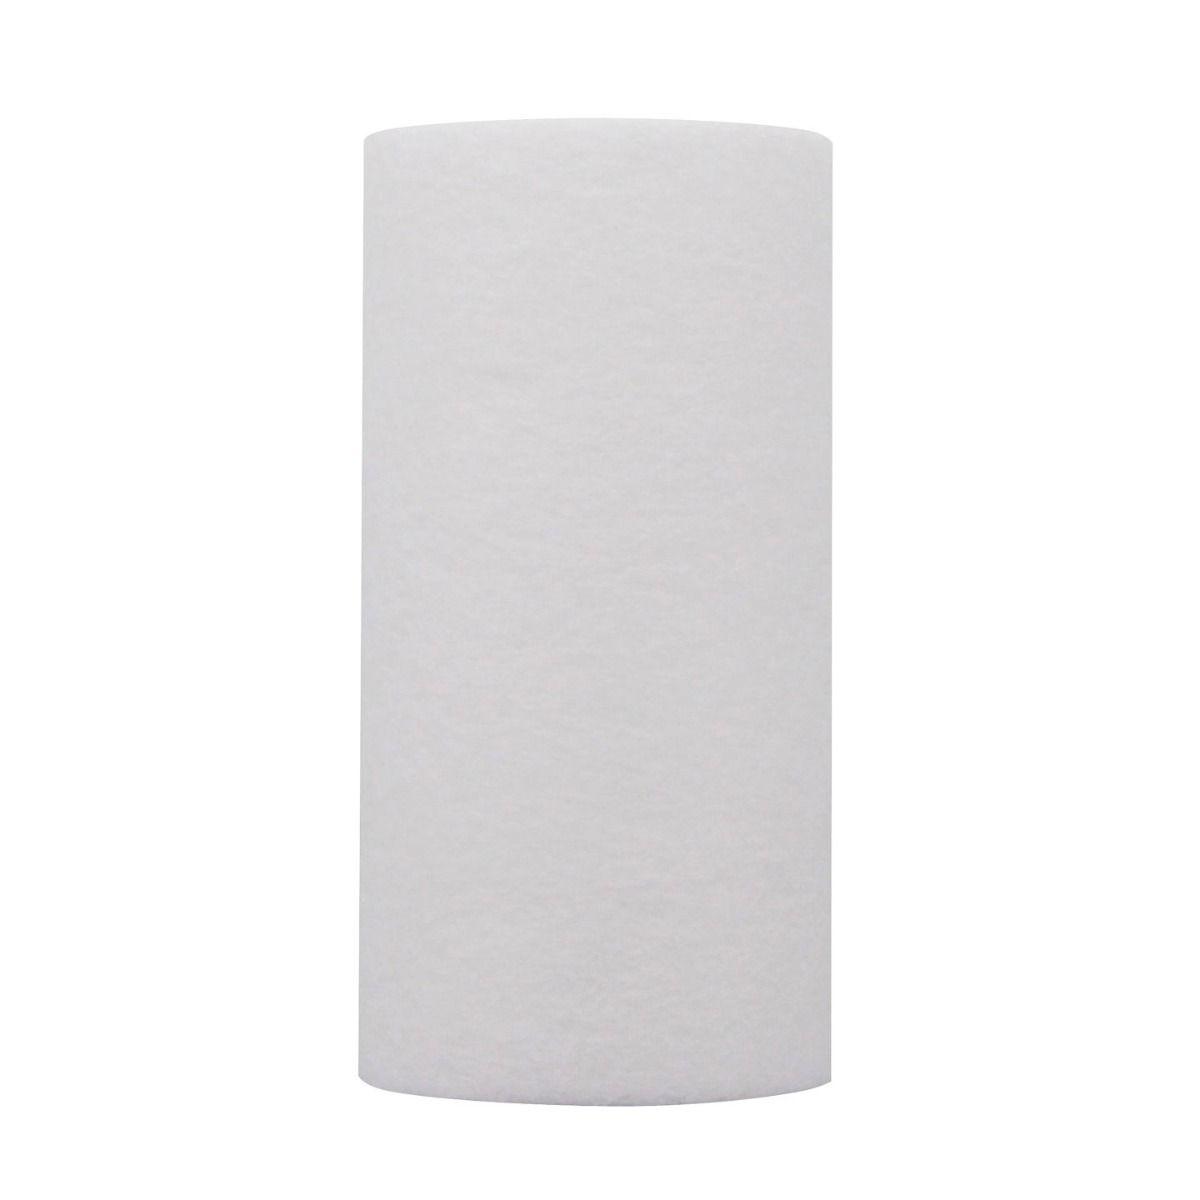 Hydronix SDC-25-0501  Sediment Polypropylene Water Filter Cartridge